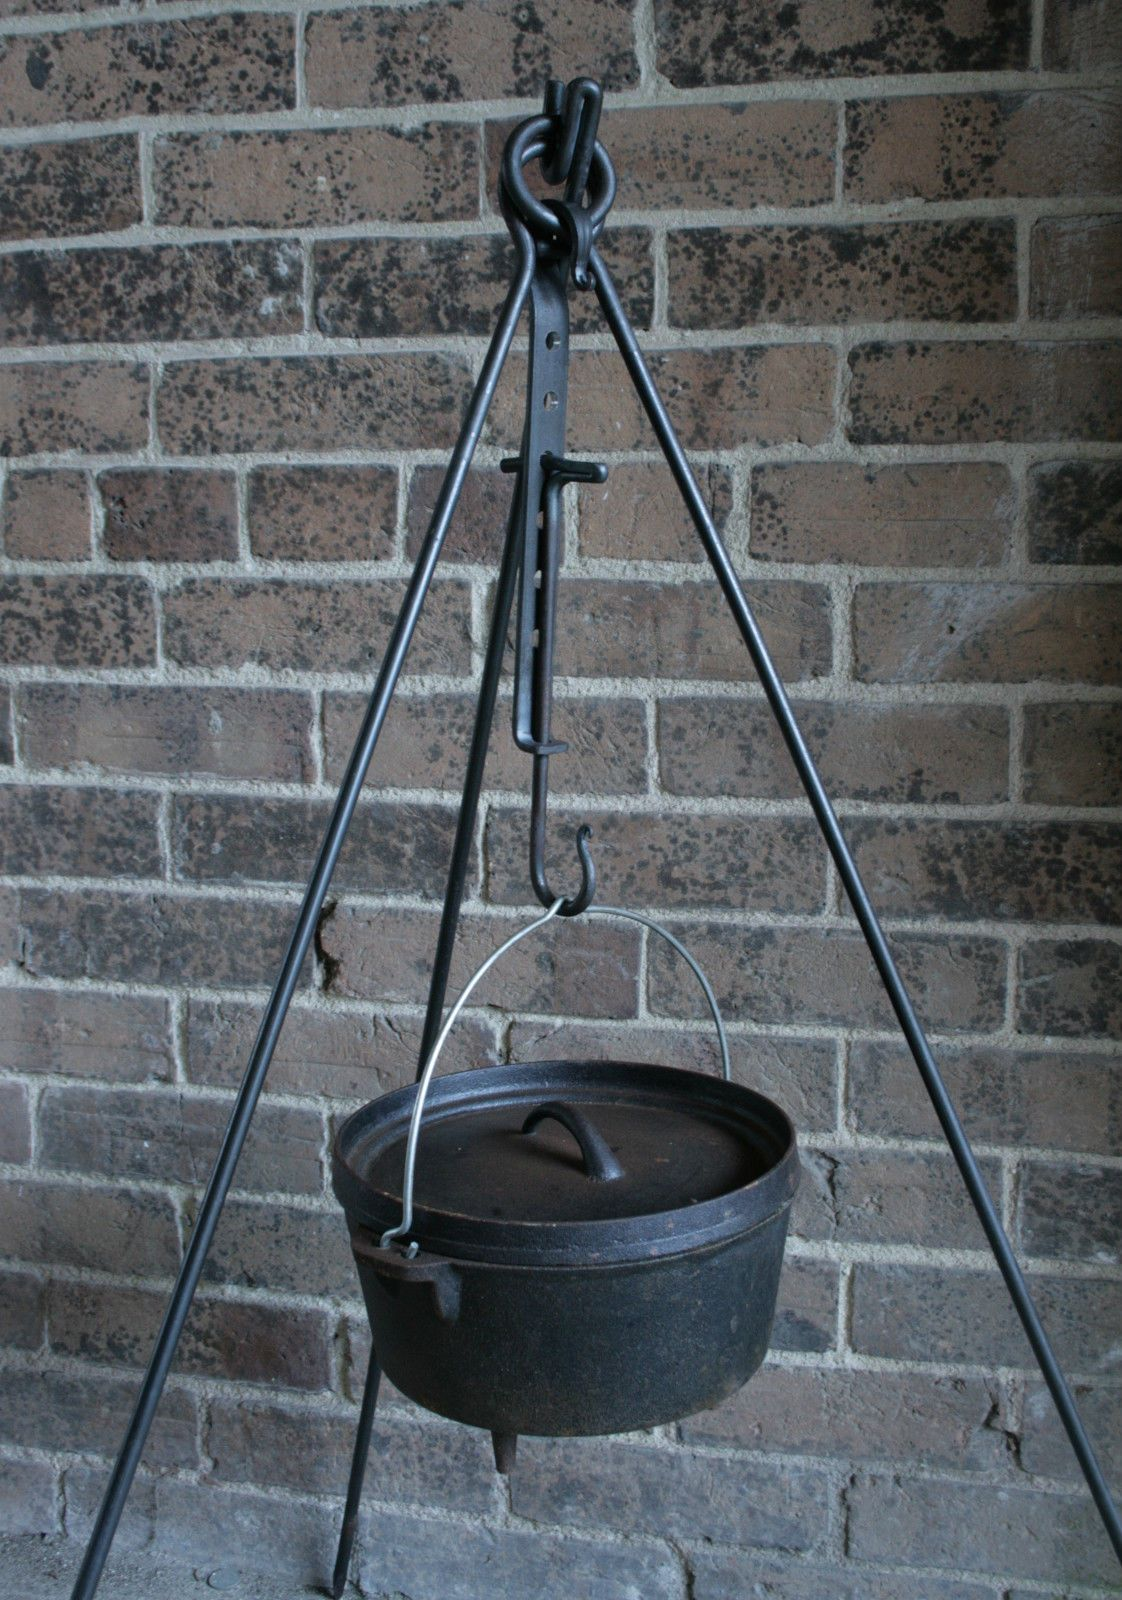 Details About Campfire Cooking Tripod Trammel Hook Bushcraft Dutch Oven Bell Tent Yurt In 2020 Campfire Cooking Bell Tent Fire Cooking